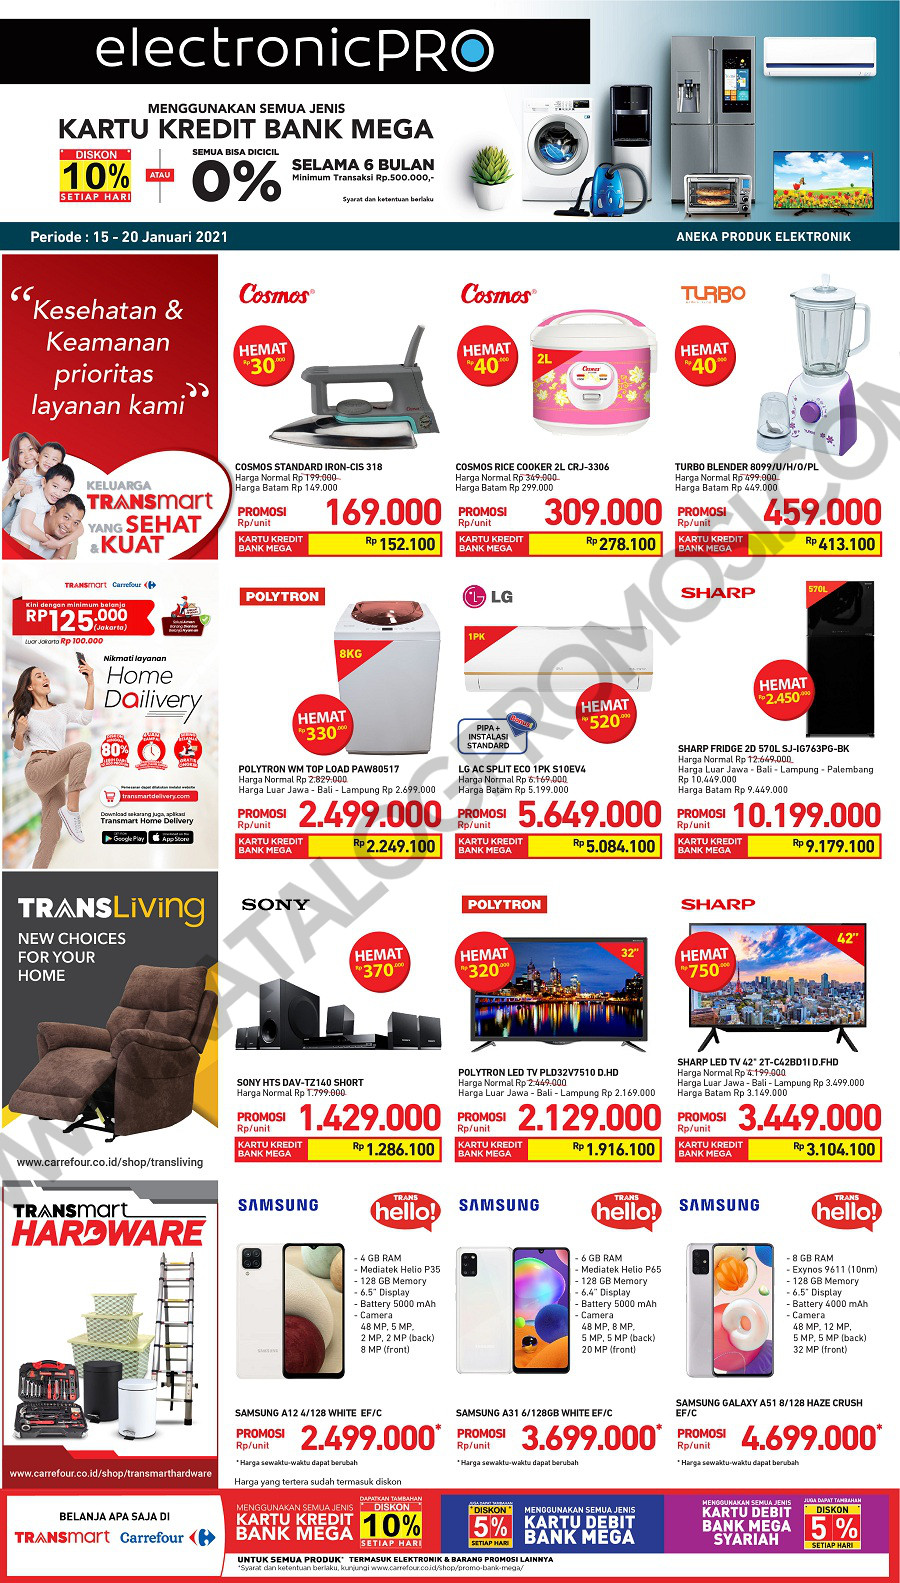 Promo TRANSMART CARREFOUR Katalog Weekend JSM periode 15-19 Januari 2021